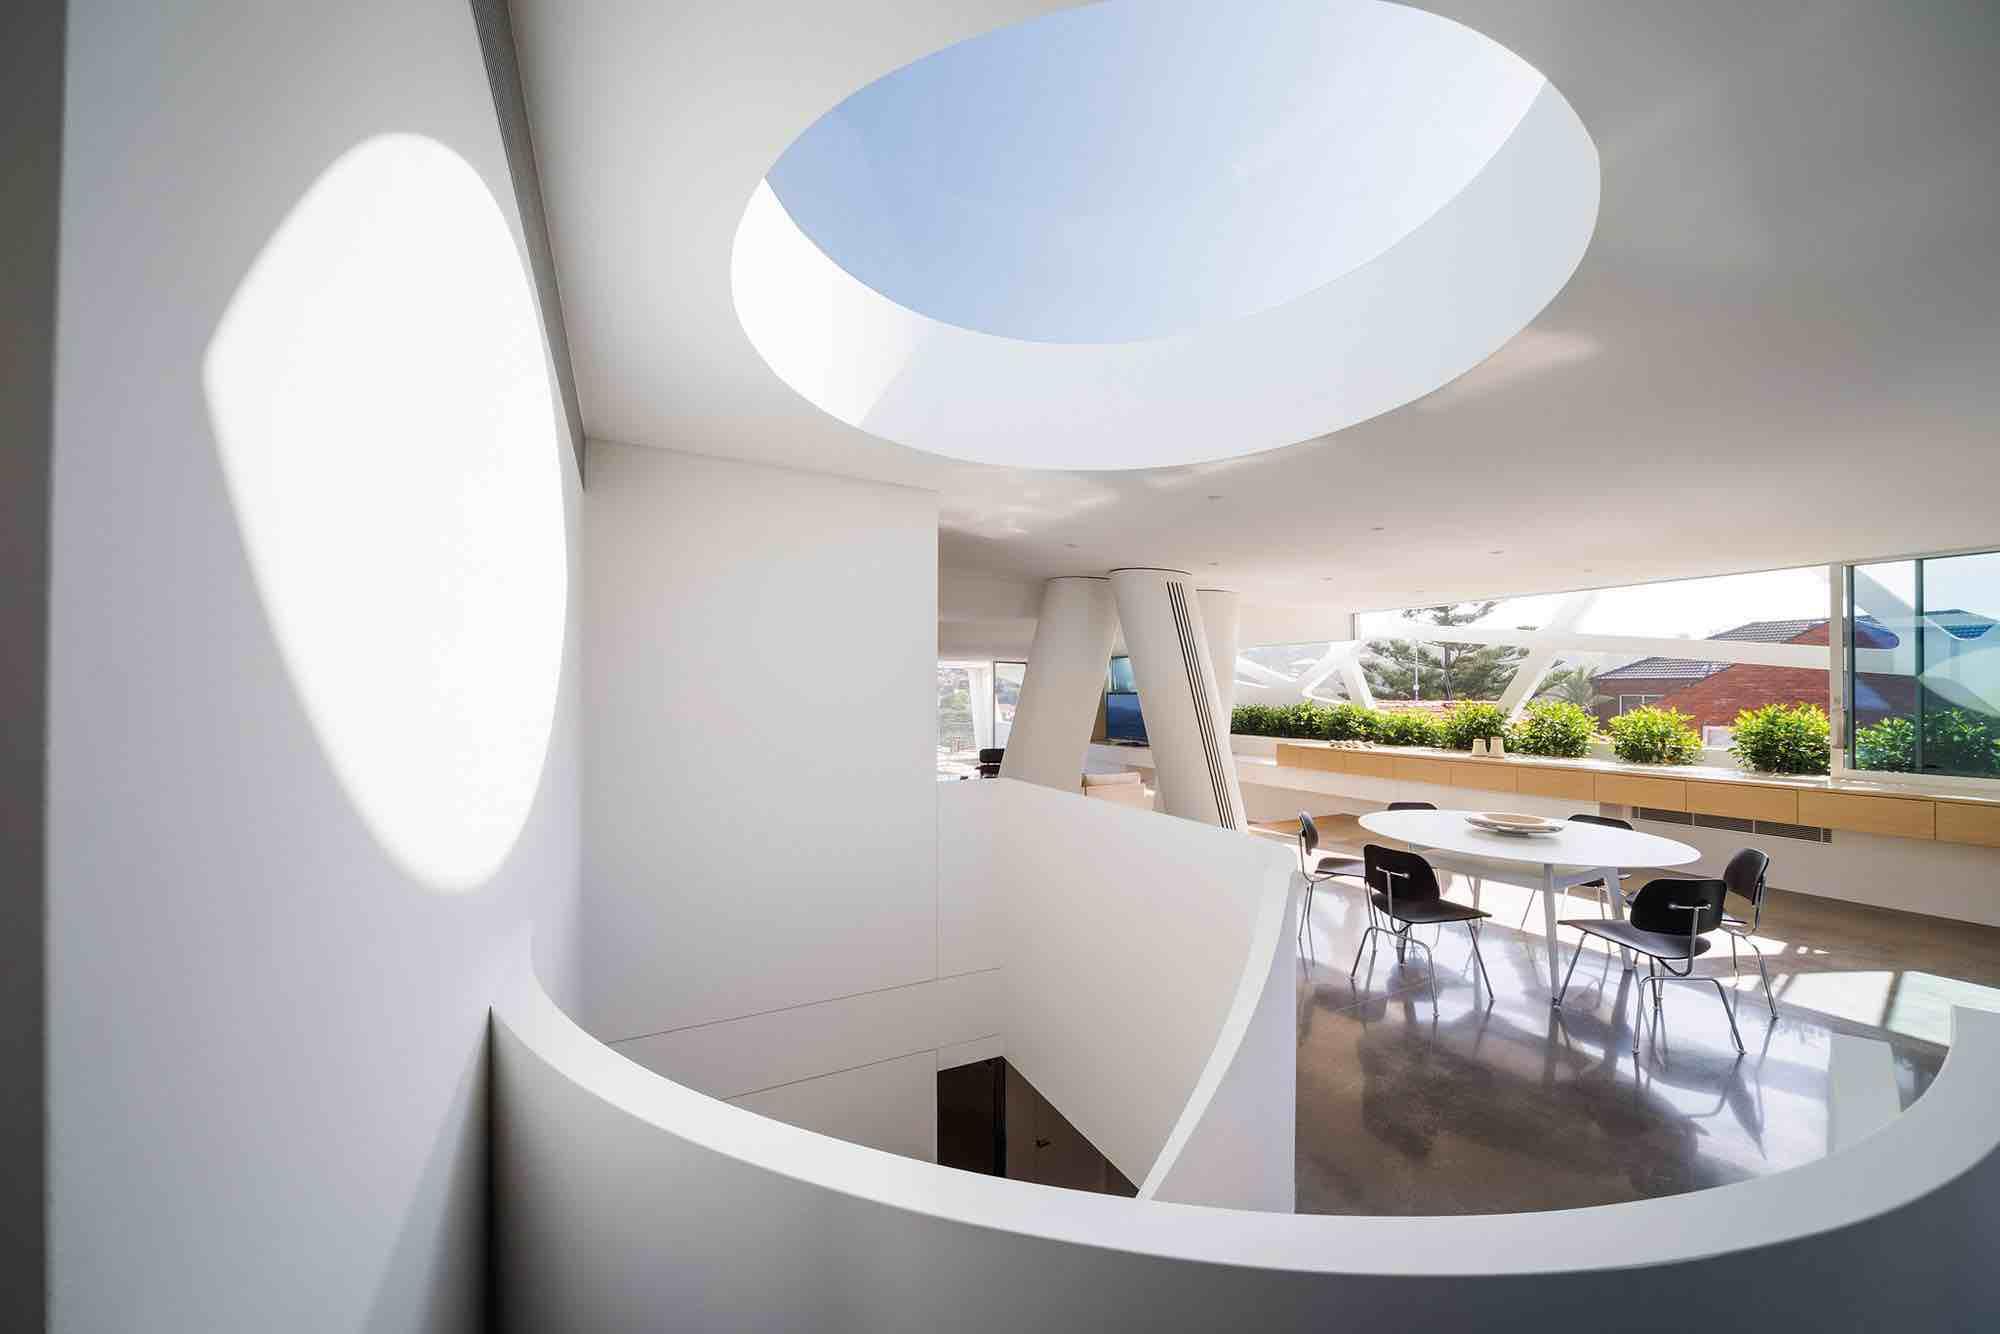 hewlett-street-house-mpr-design-group_hewlett_house11